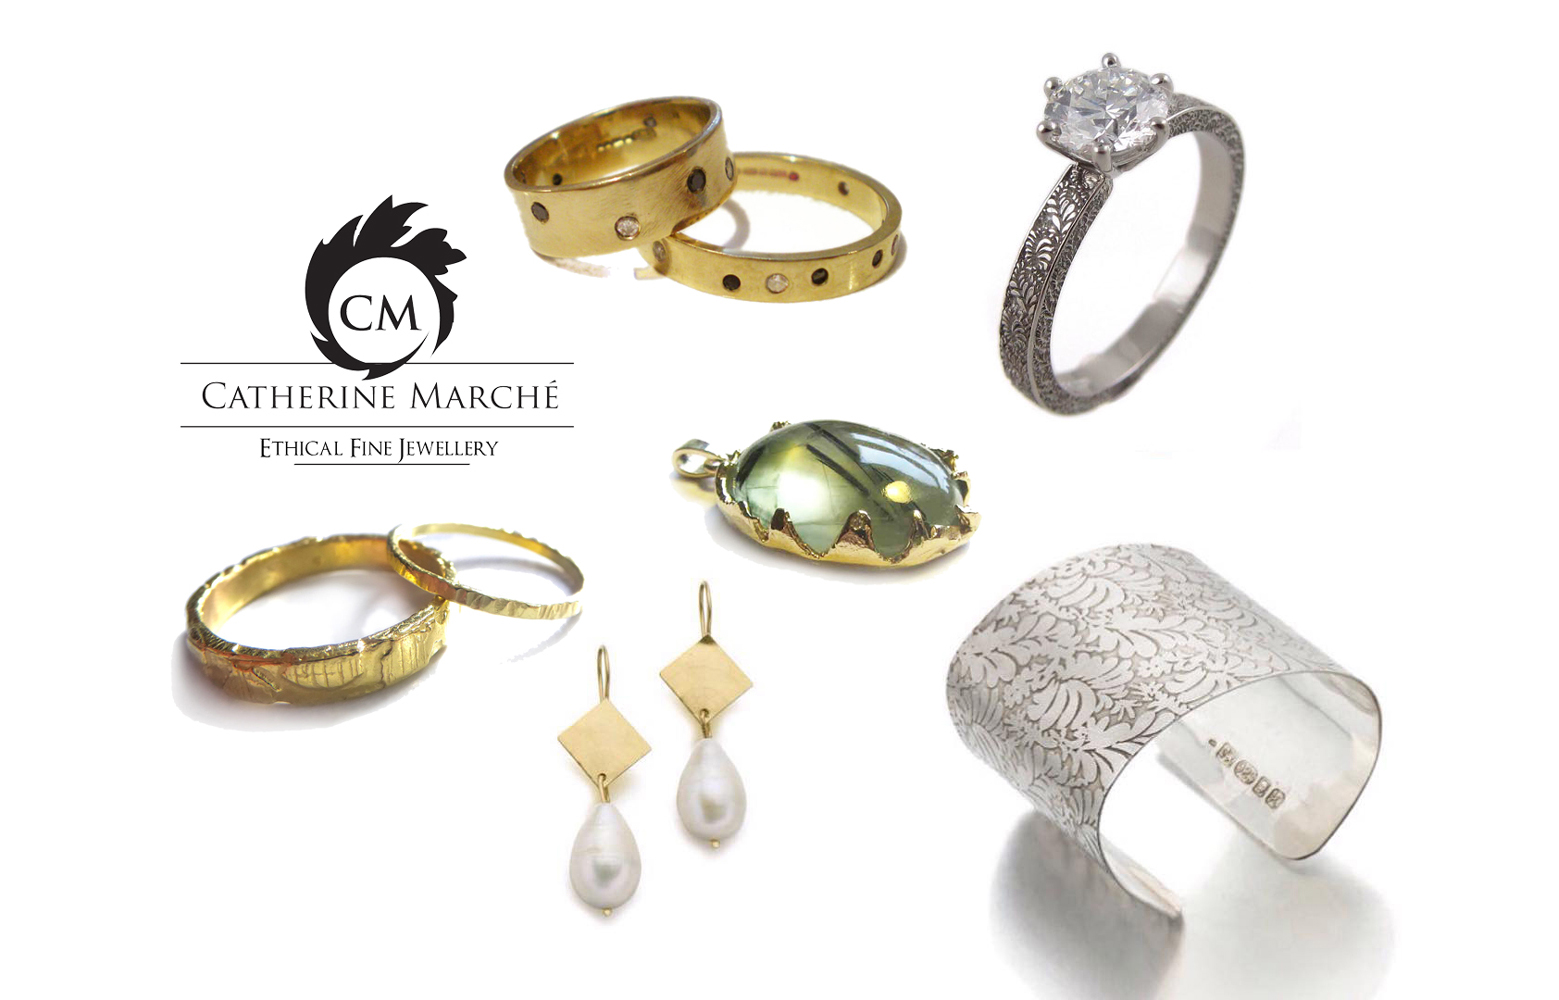 Catherine Marche Jewellery